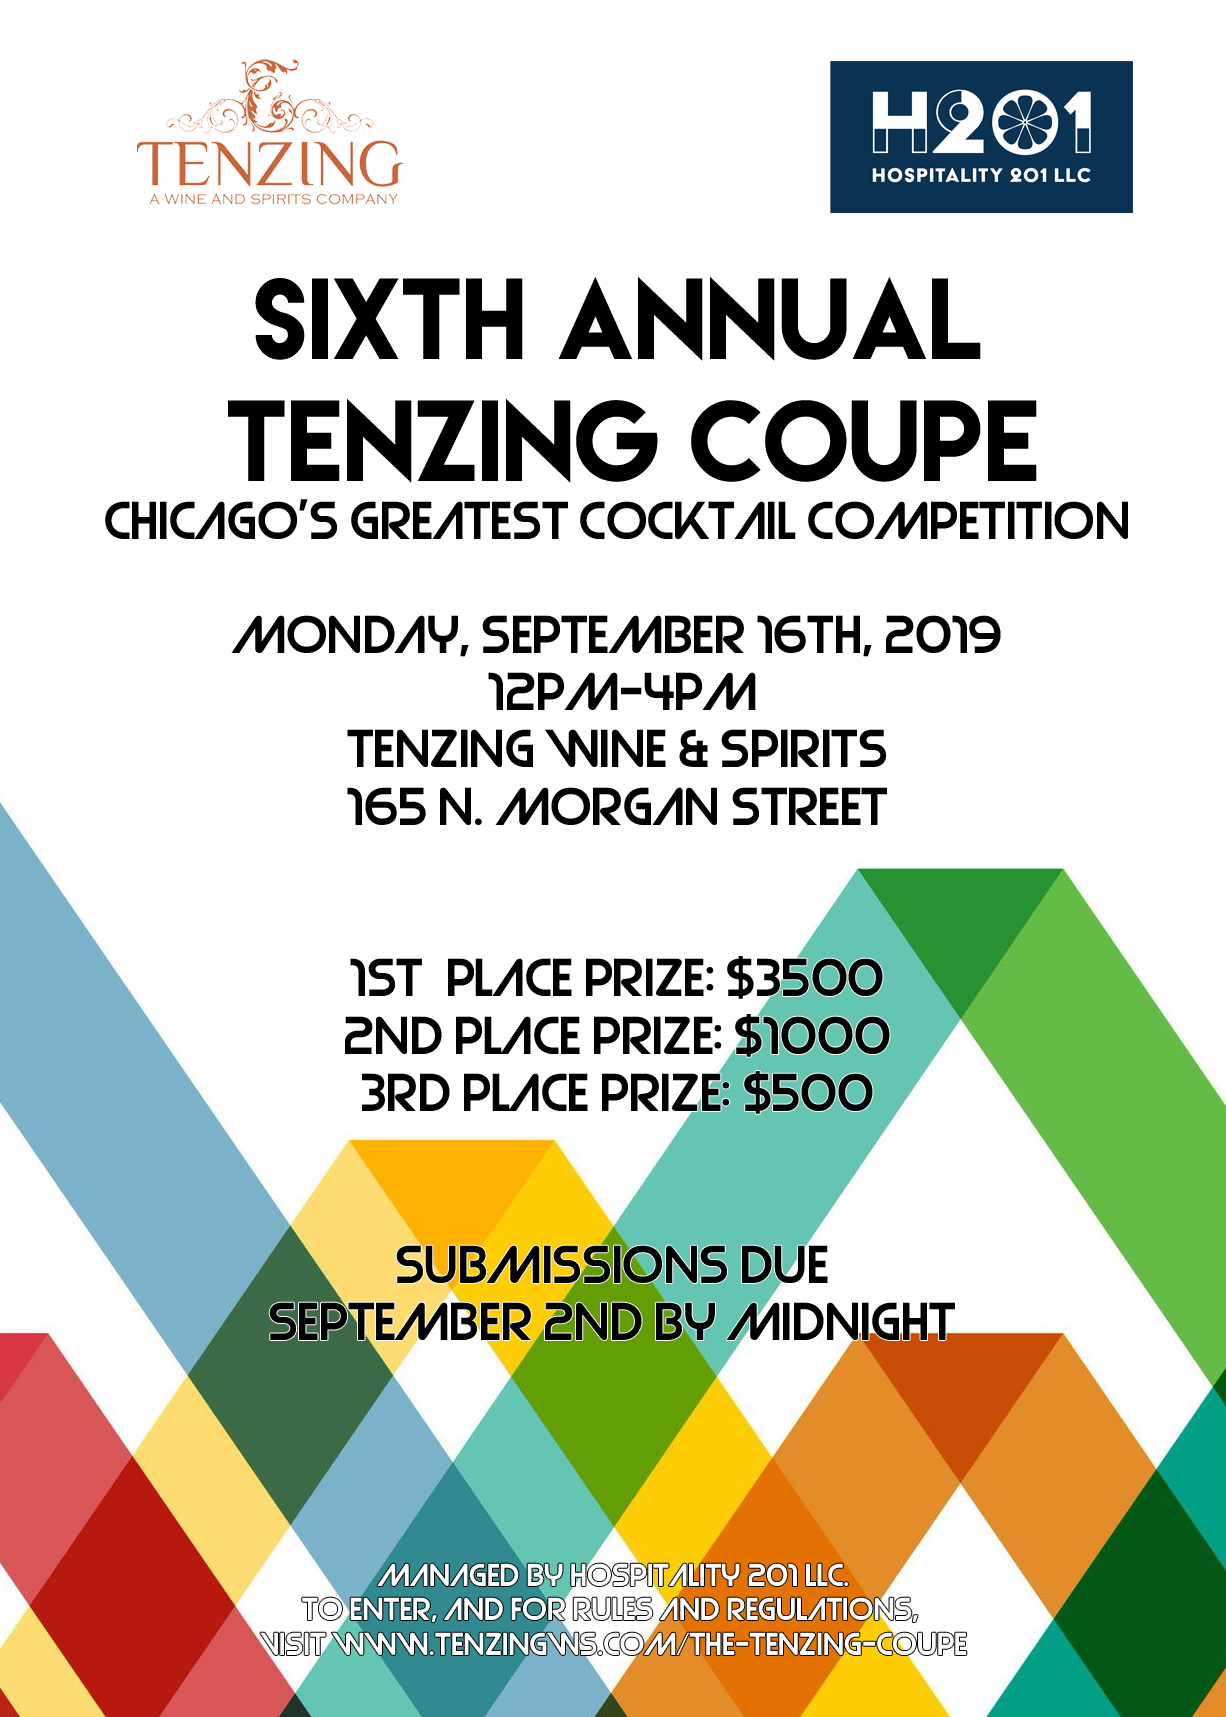 Tenzing-Coupe-Invite-2019.jpg